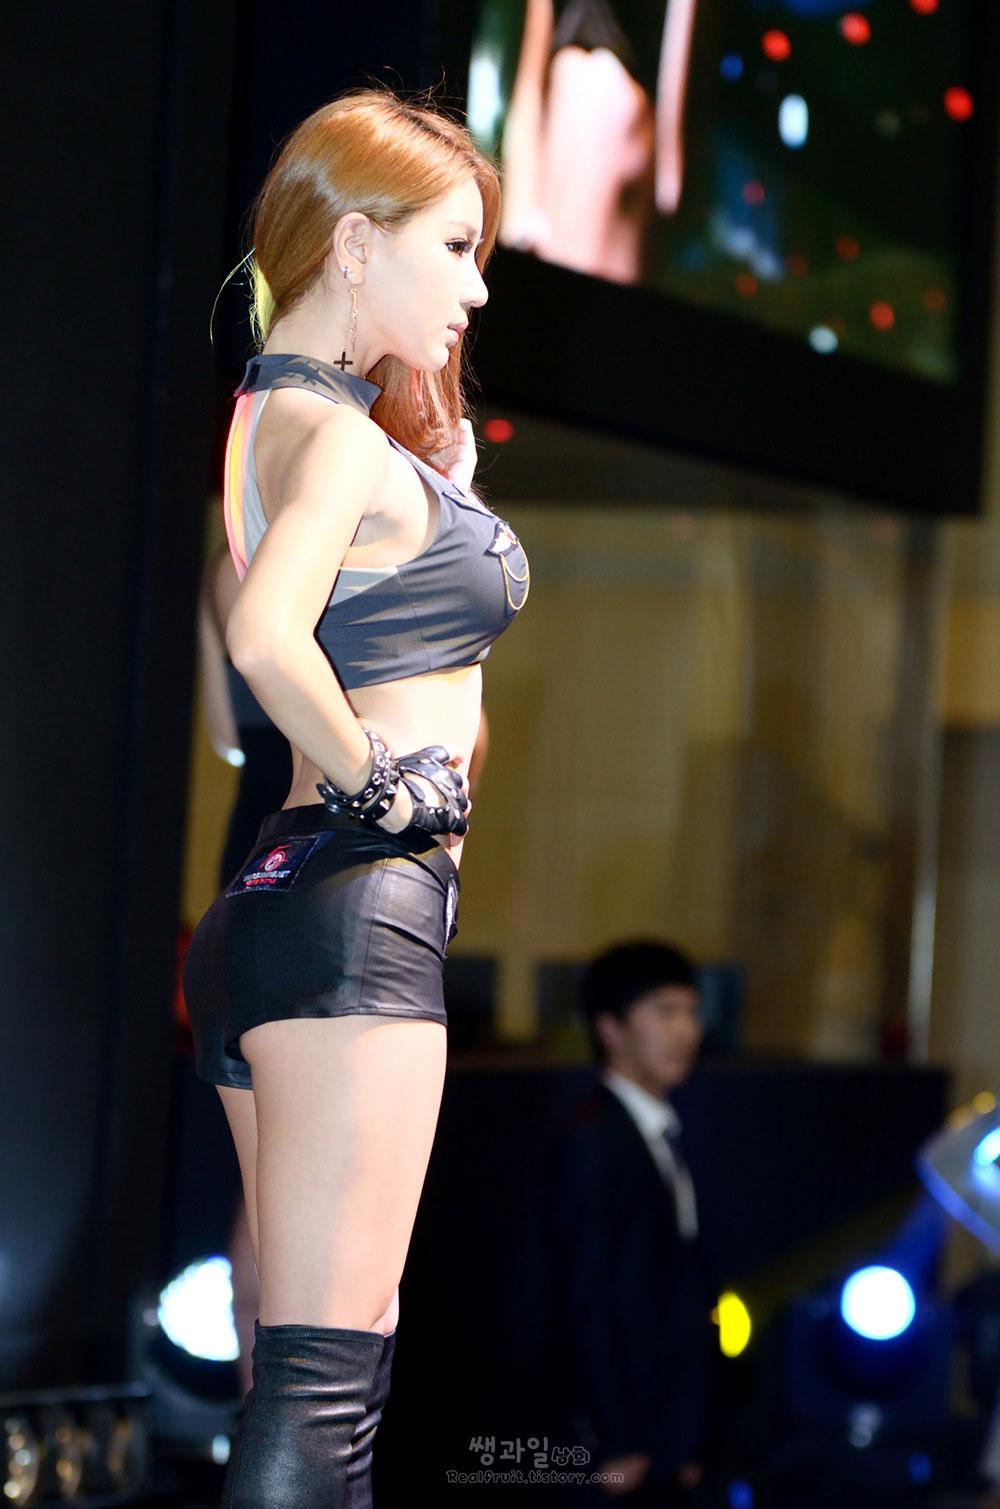 Park Si Hyun Gstar 2013 WarGaming